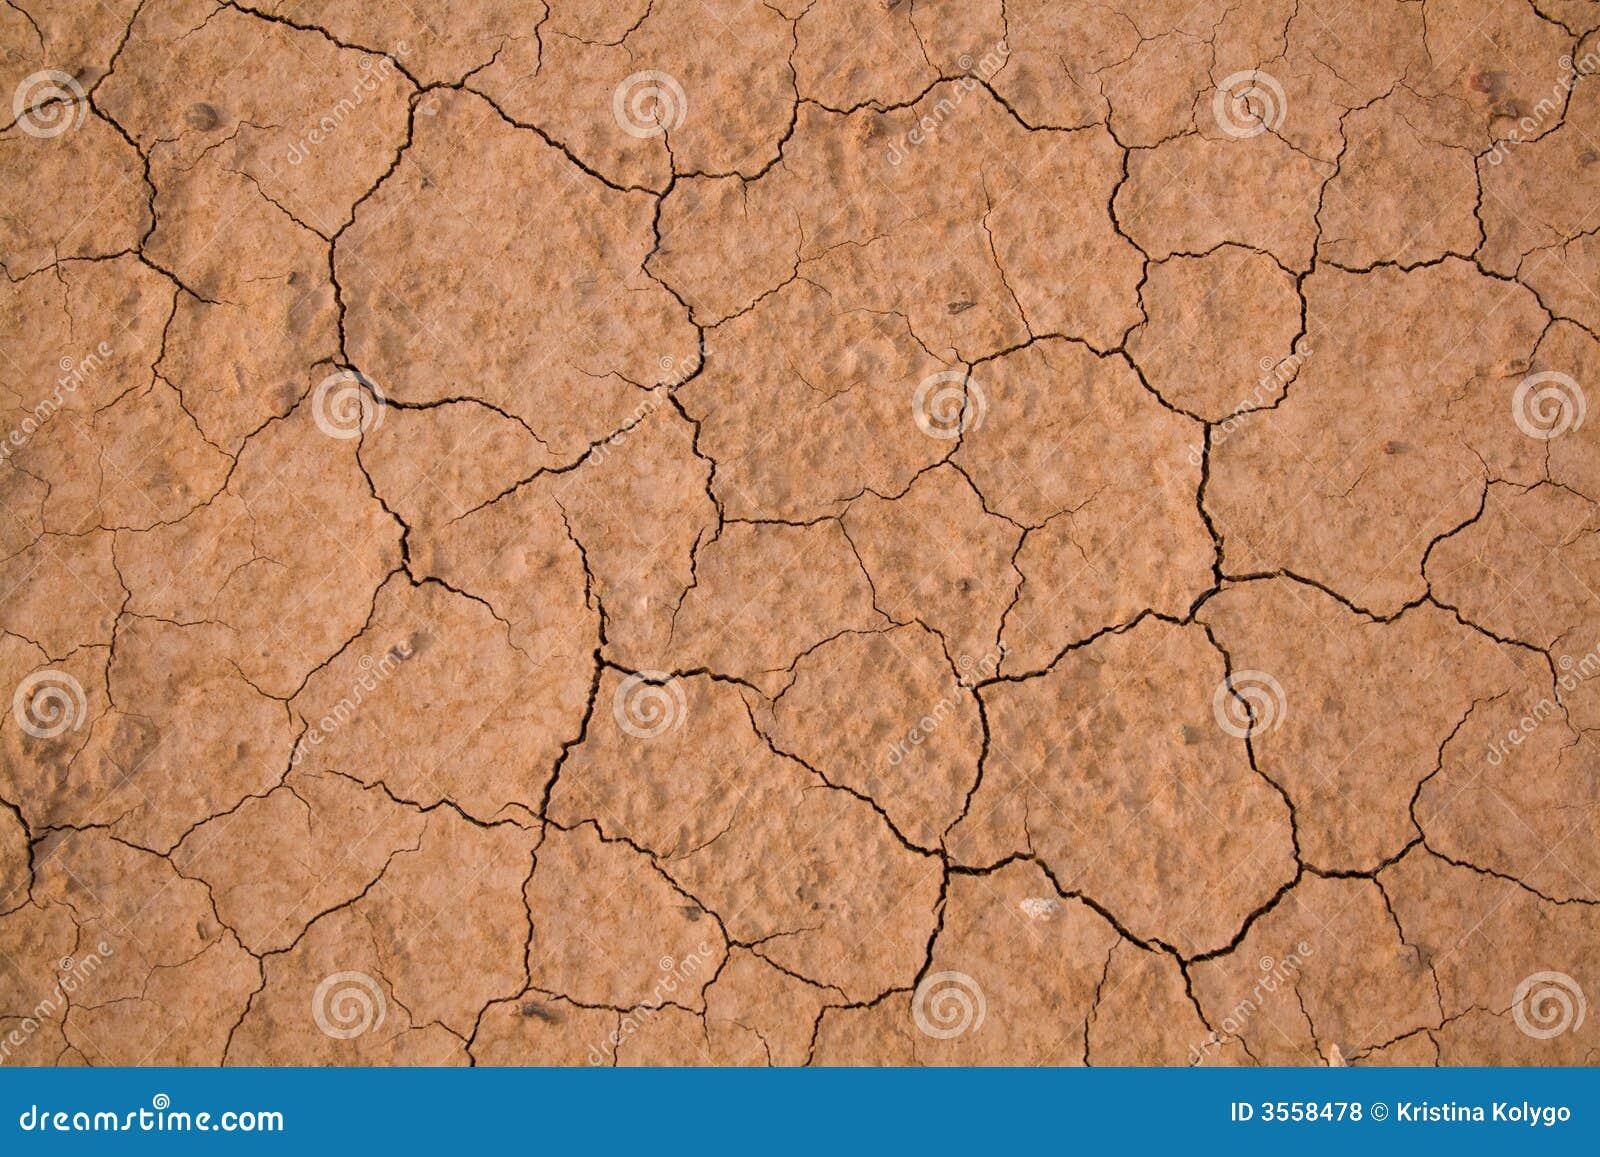 Terreno esaurito